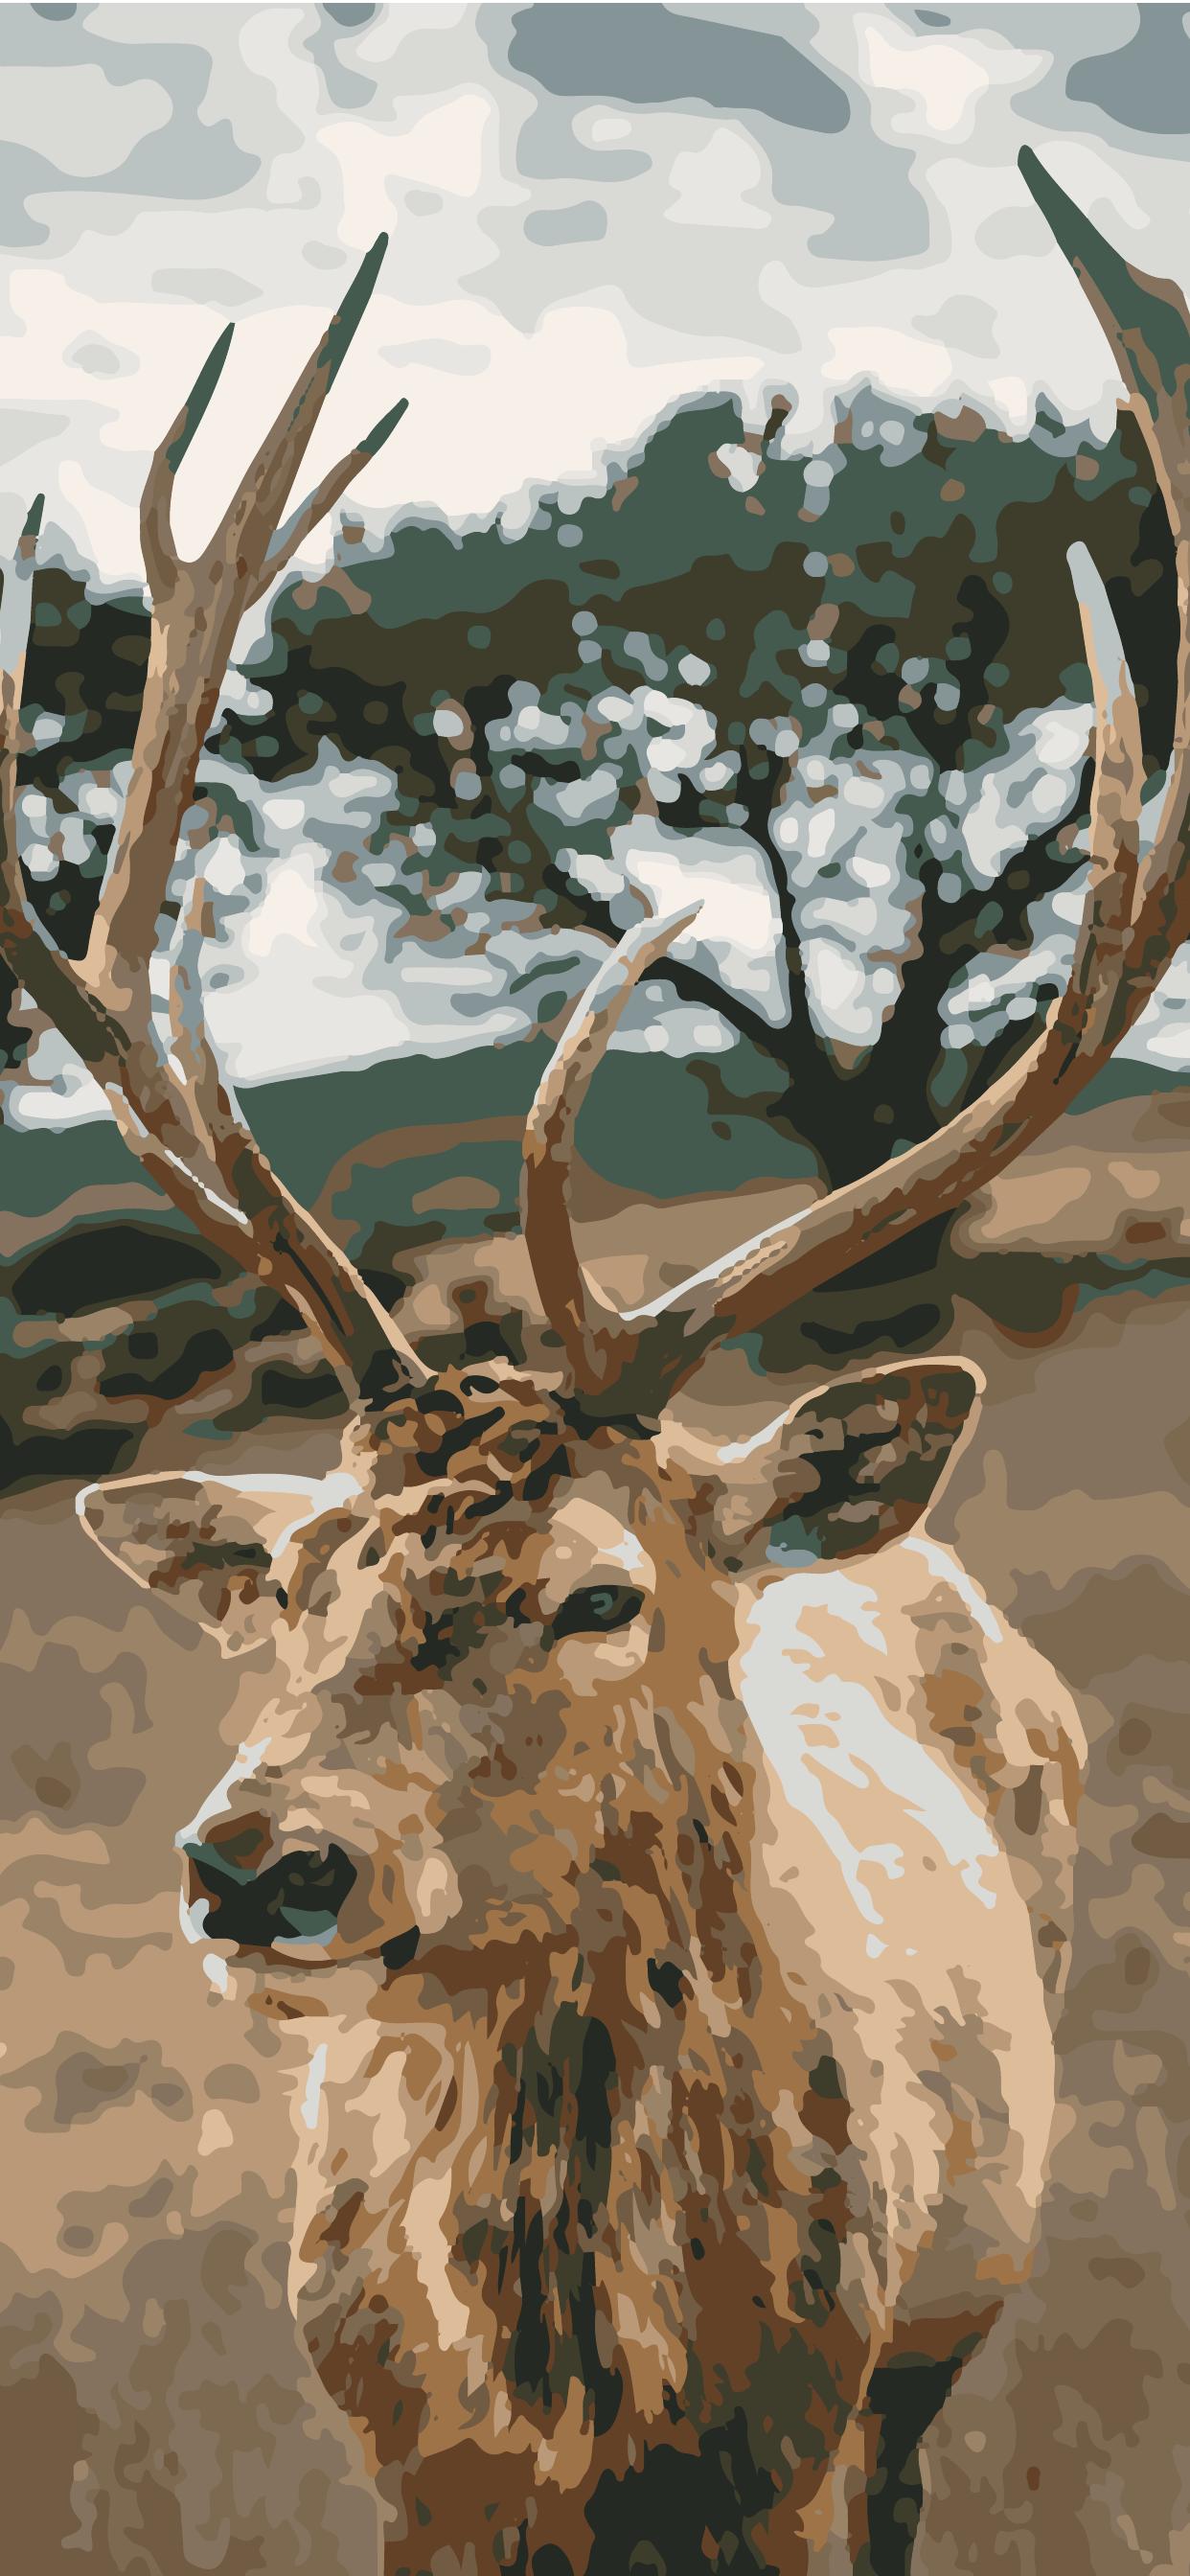 deer wallpaper phone hd